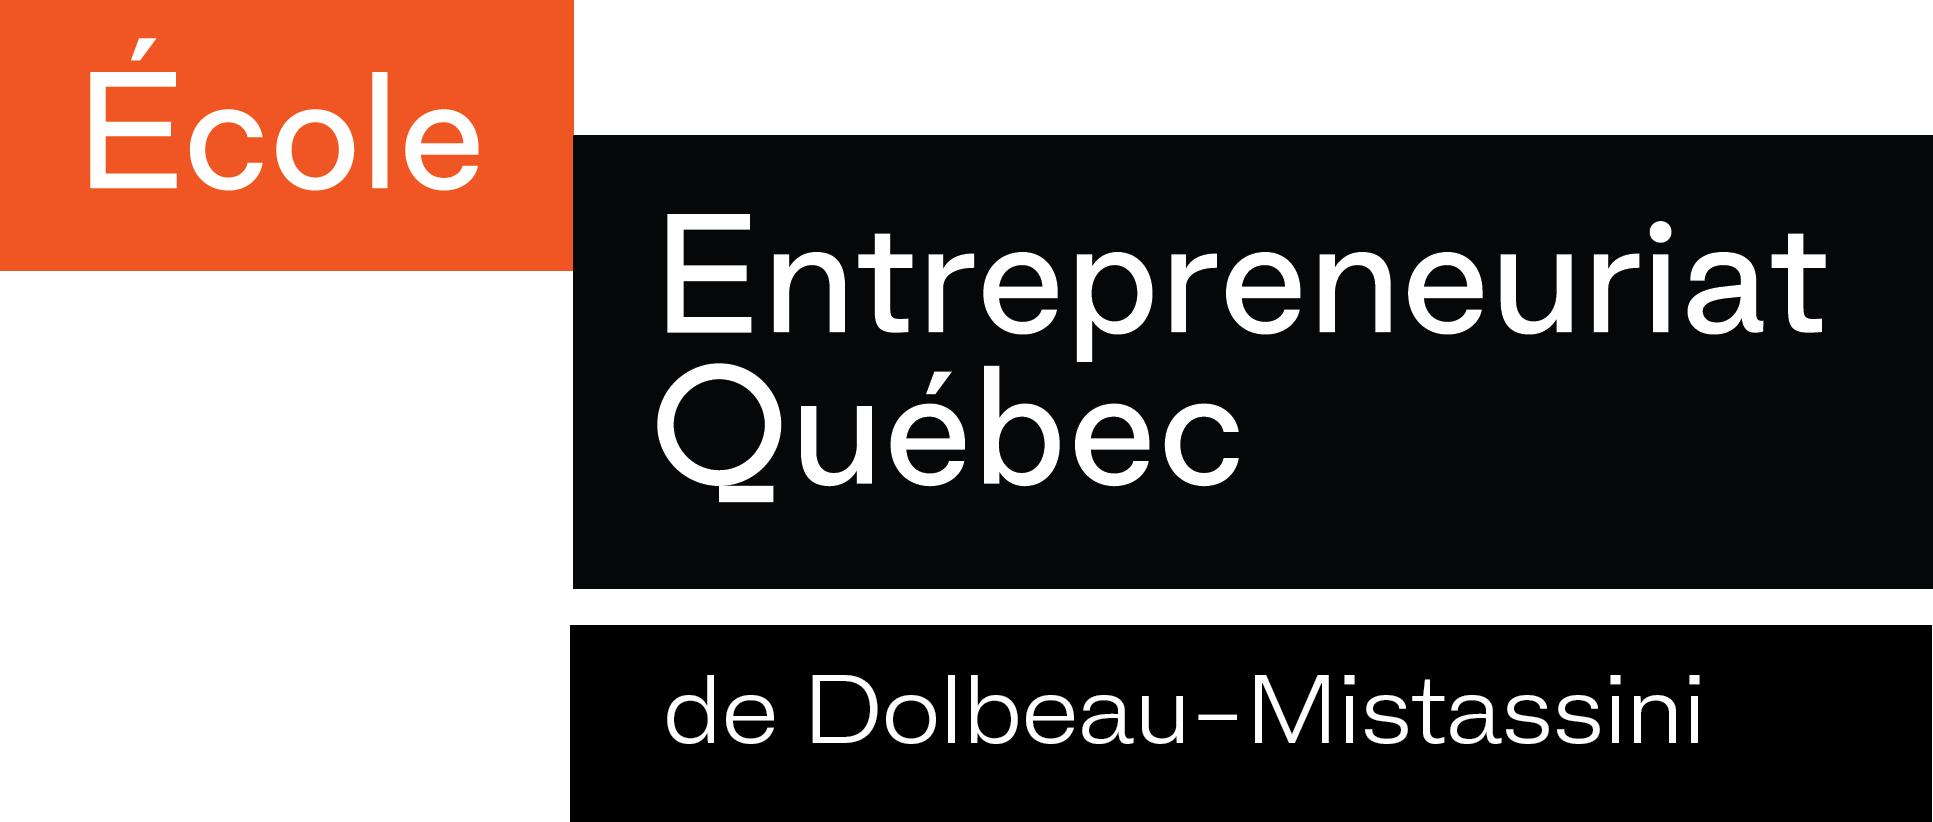 Logo ÉEQ de Dolbeau-Mistassini.jpg